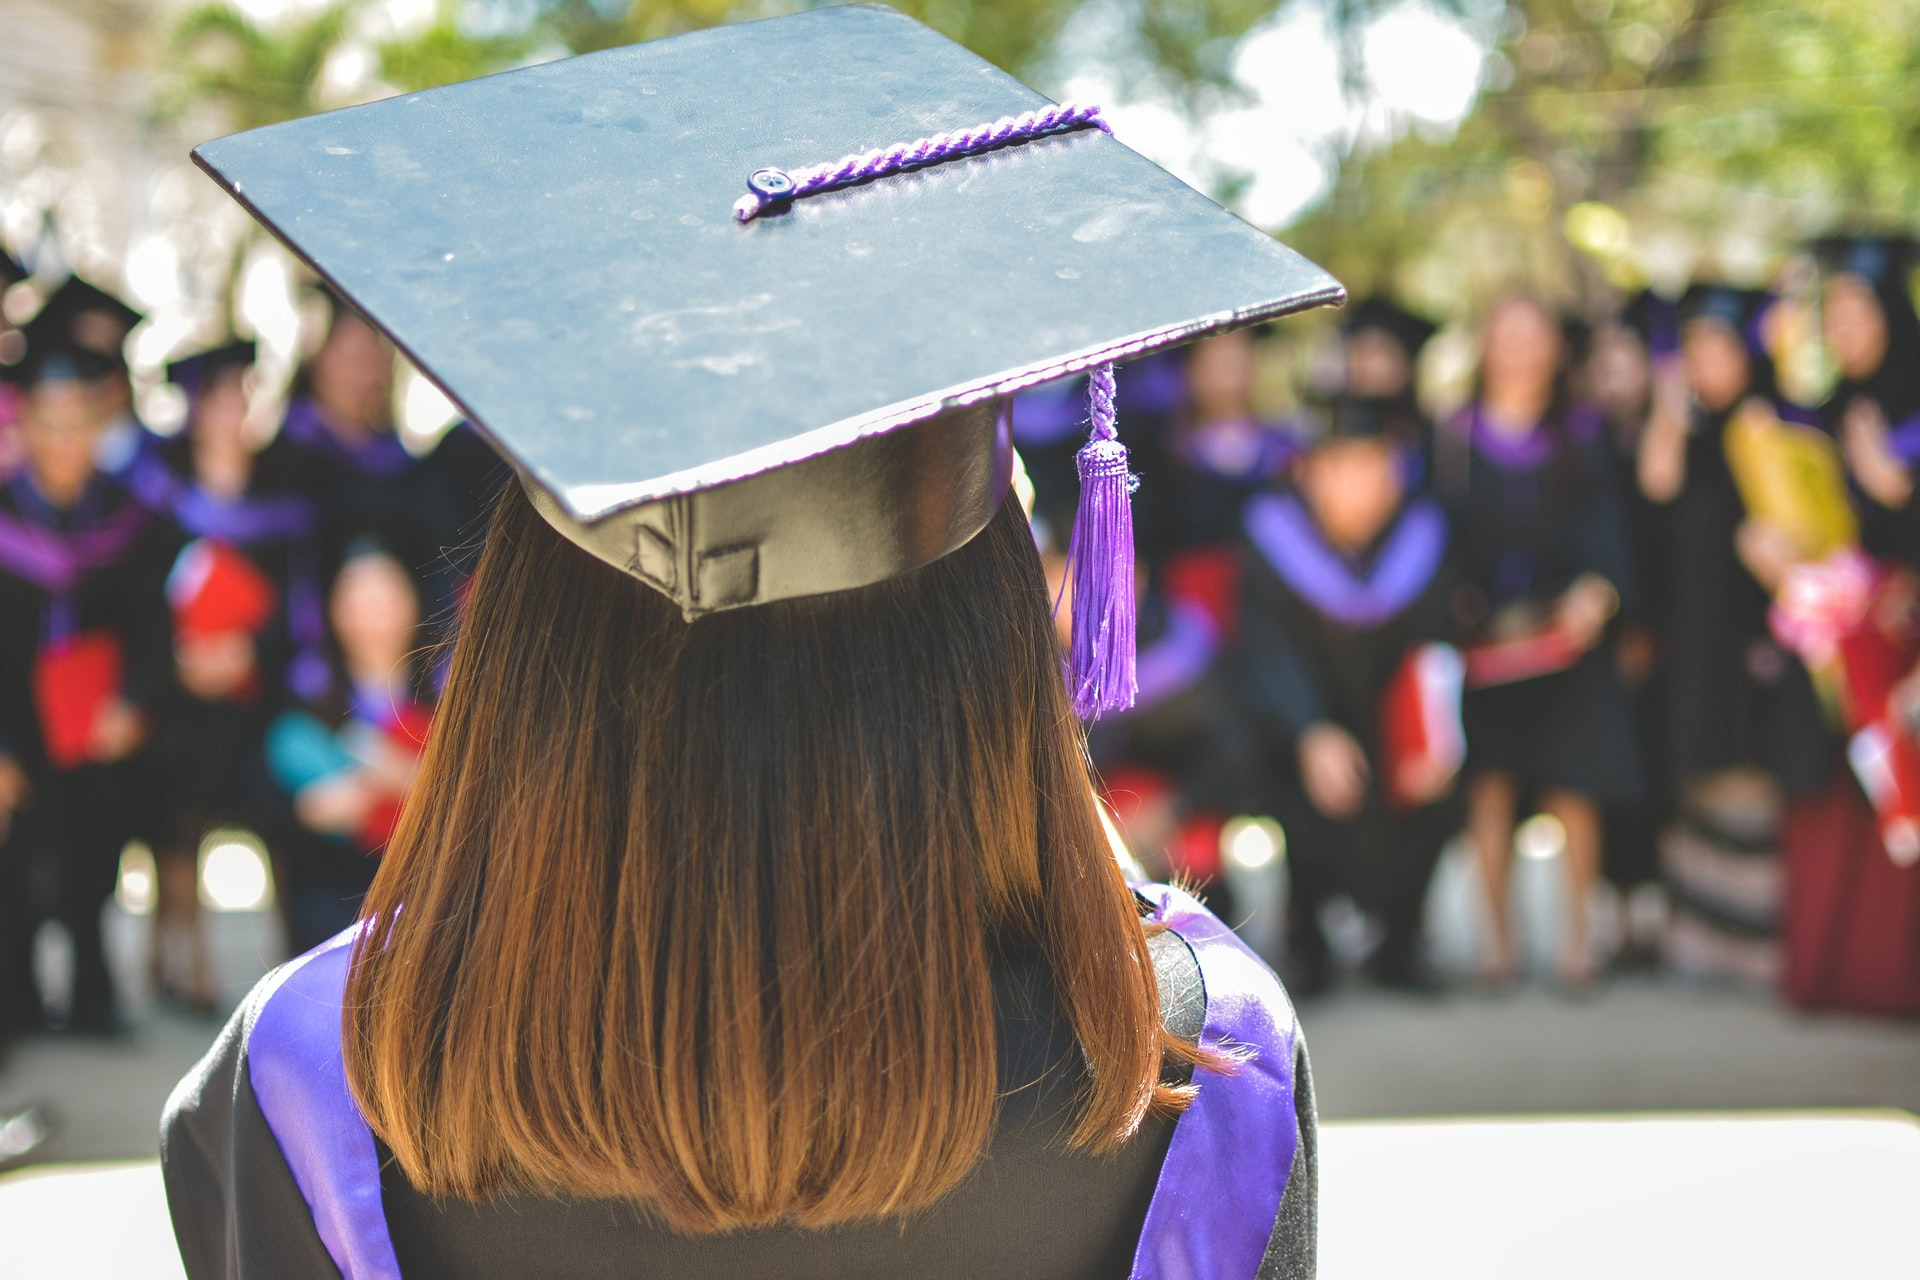 Back angle shot of a female graduate wearing a graduation cap and toga